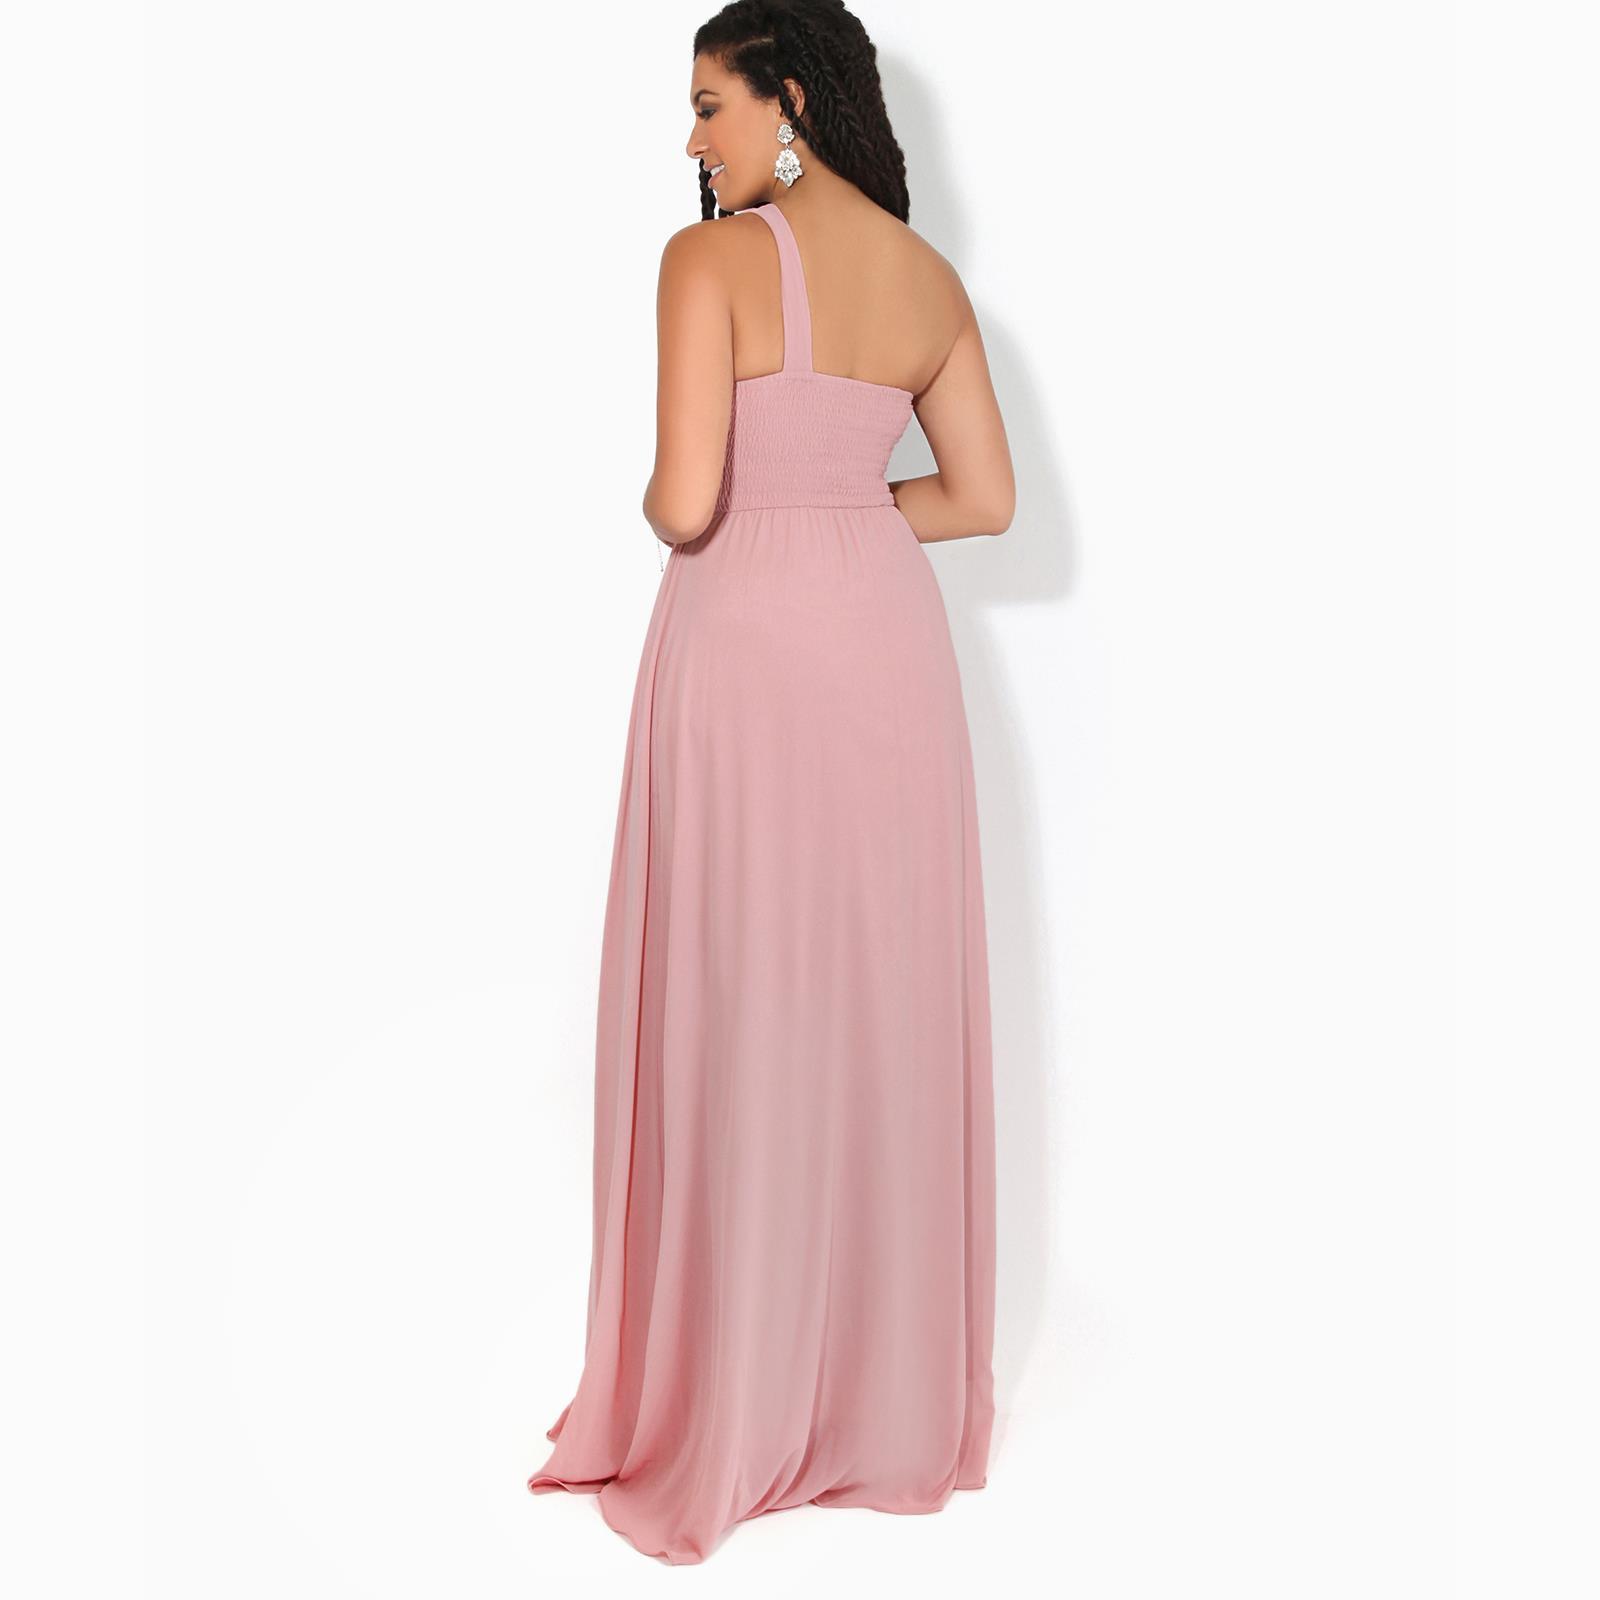 Womens-Wedding-Bridesmaid-Prom-Dress-Formal-One-Off-Shoulder-Long-Evening-8-18 thumbnail 24